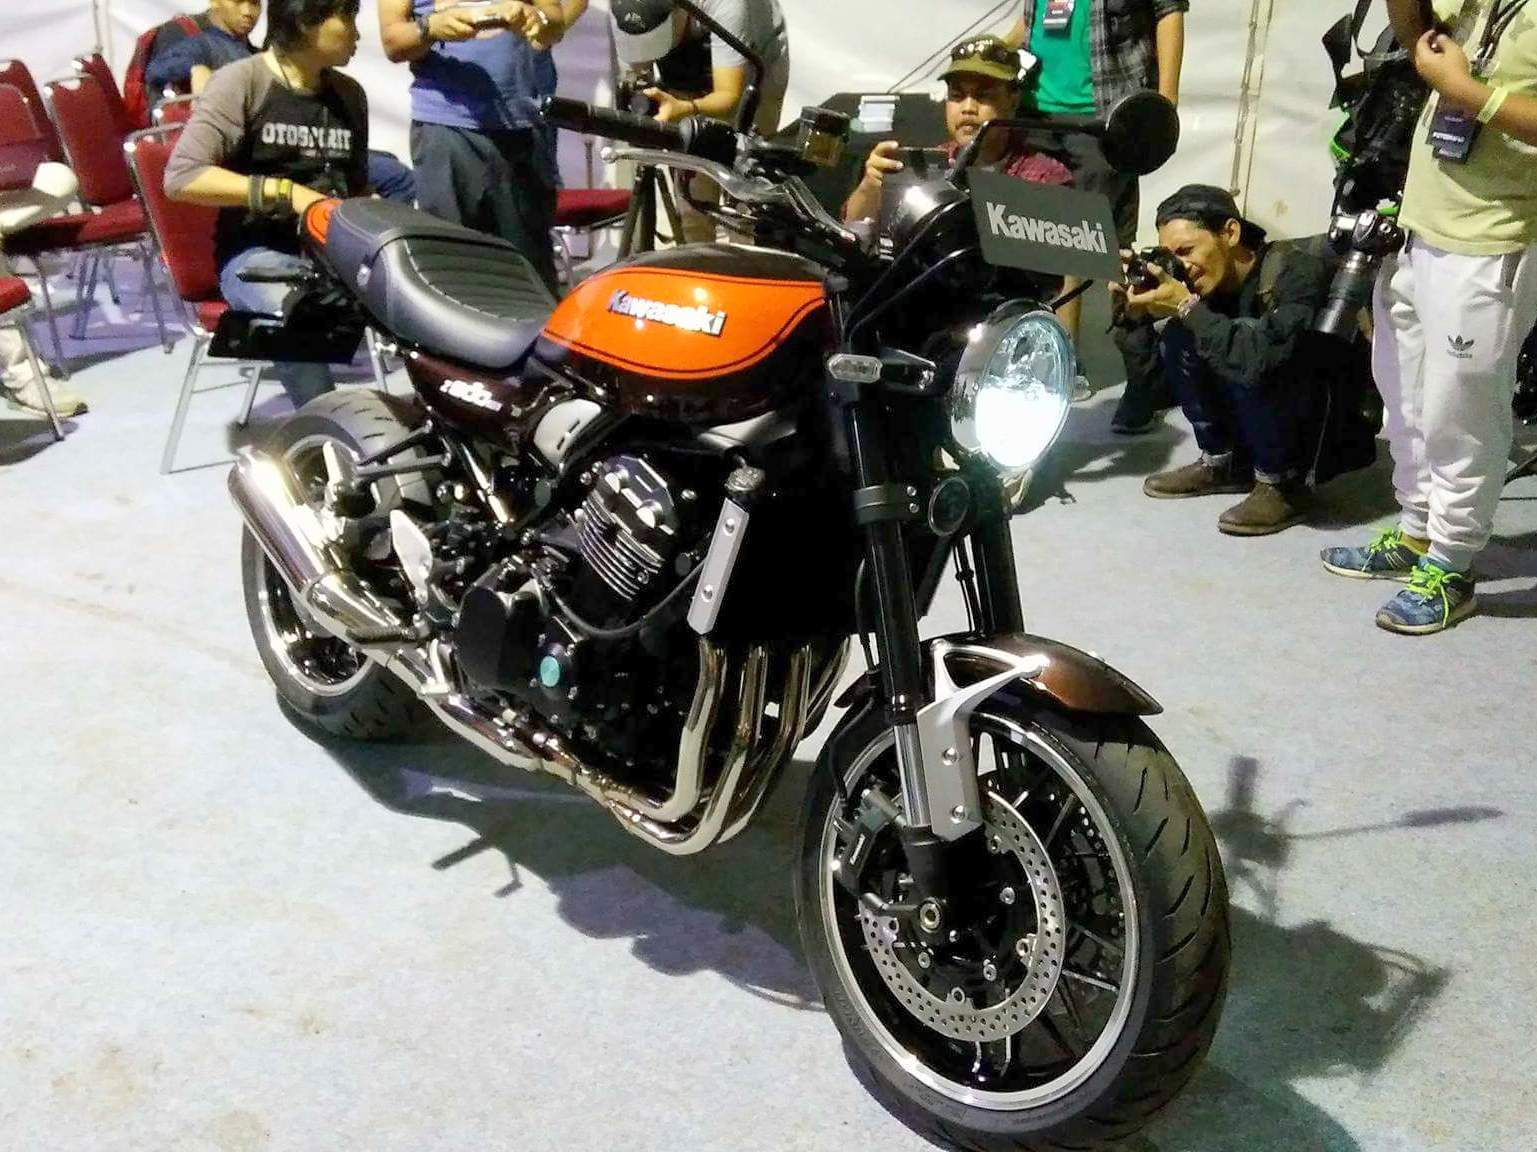 Kawasaki Indonesia resmi rilis Z900RS di Kawasaki Bikers Week 2017